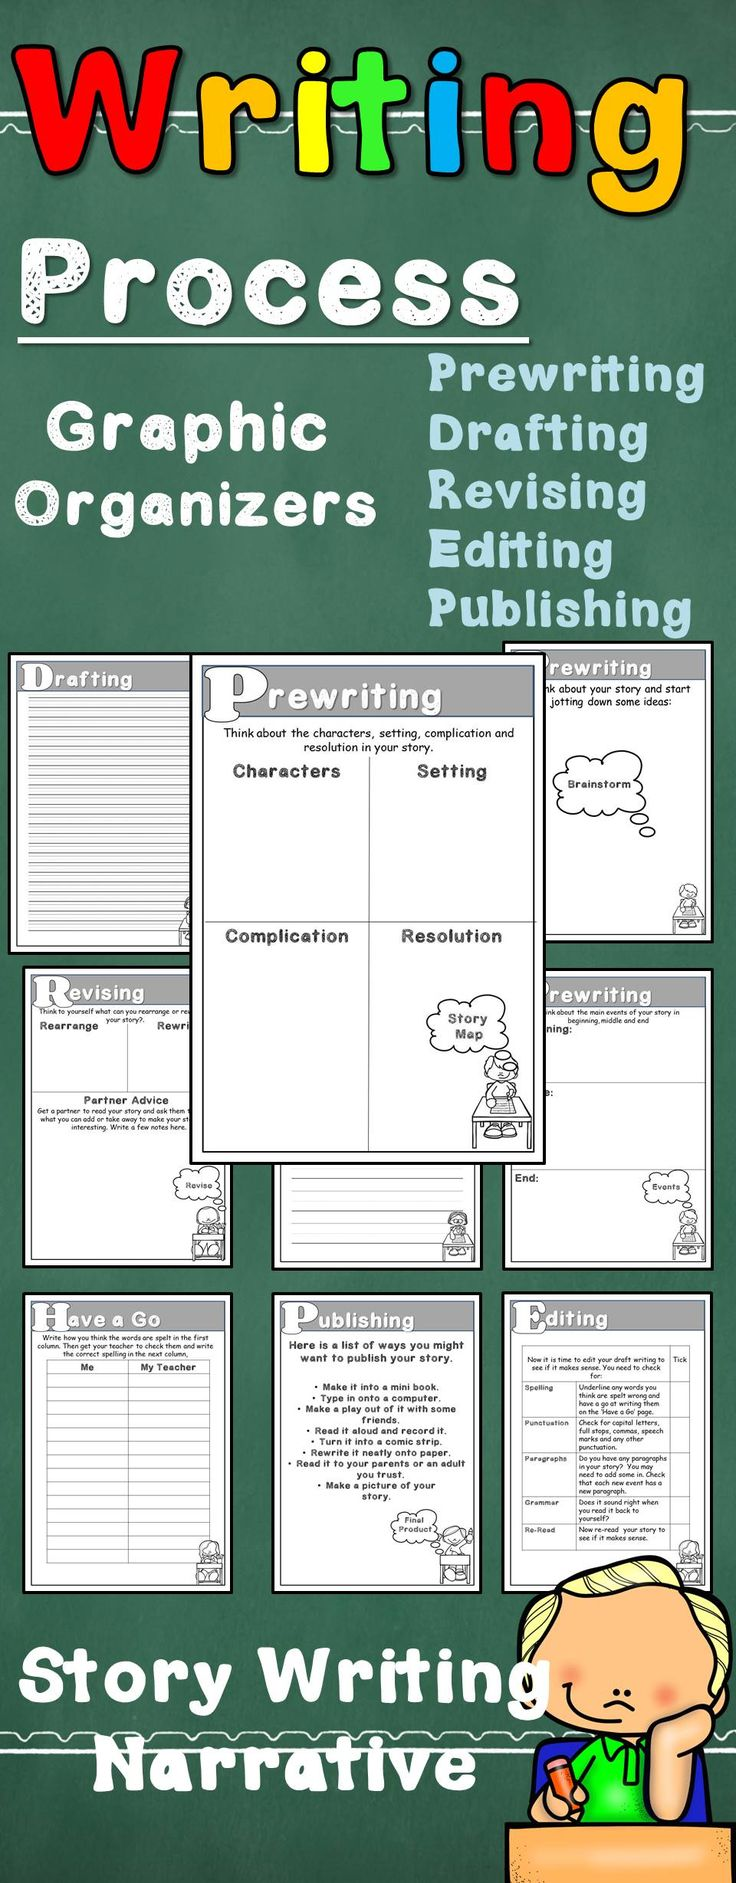 Process of writing a story